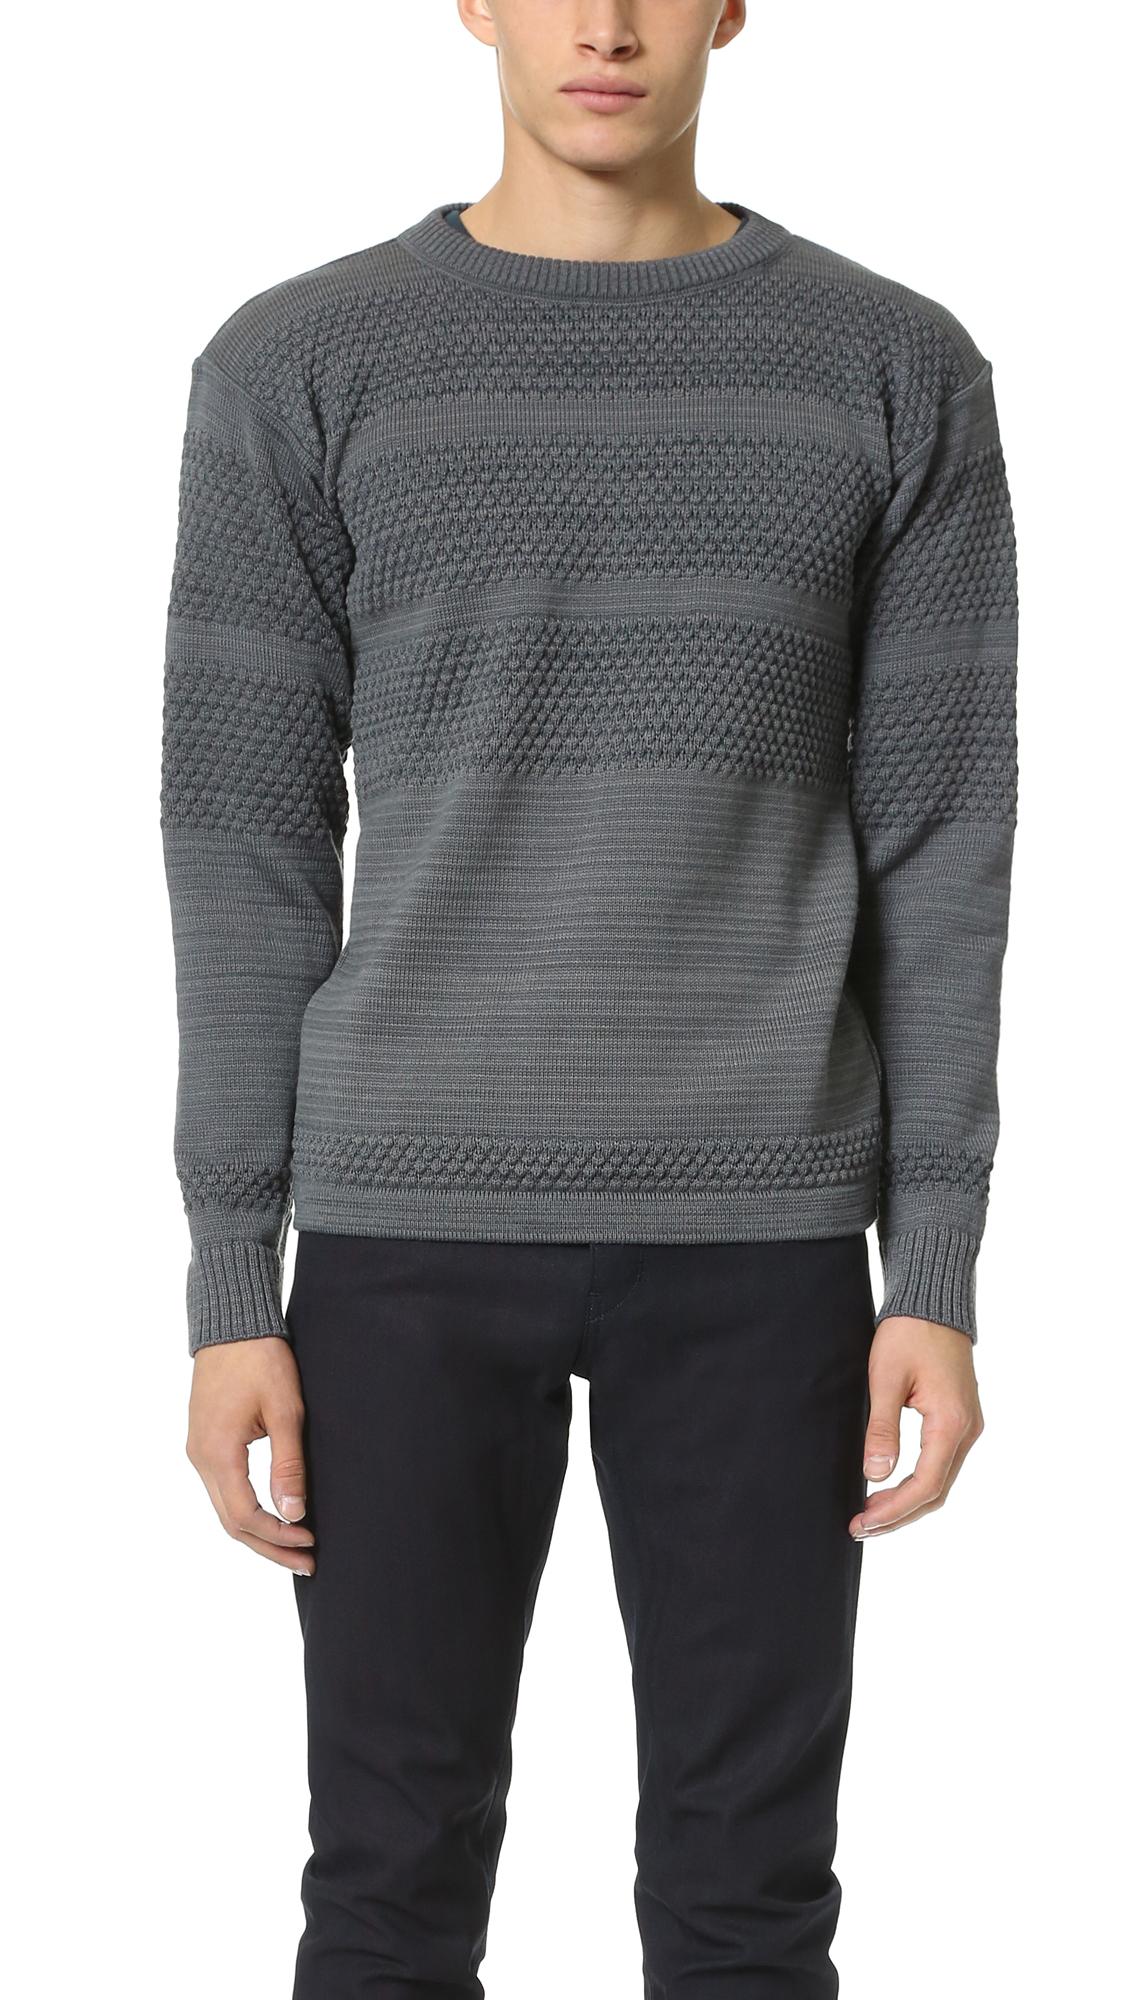 Fisherman Crew Neck Sweater